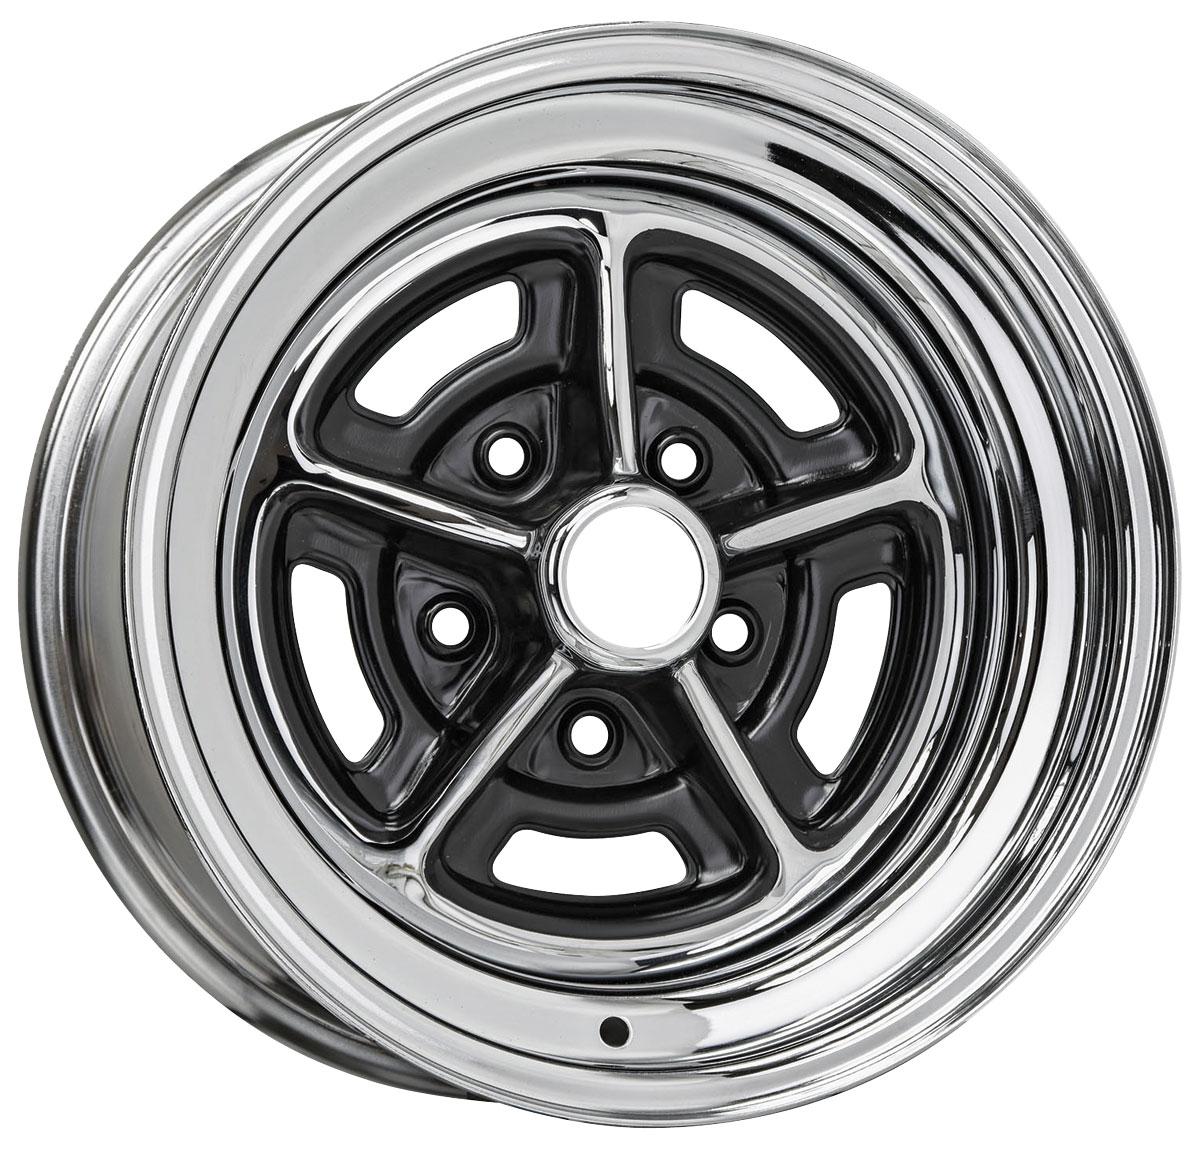 "Wheel, Rally, Buick 15x6, 3.5"" Backspace"